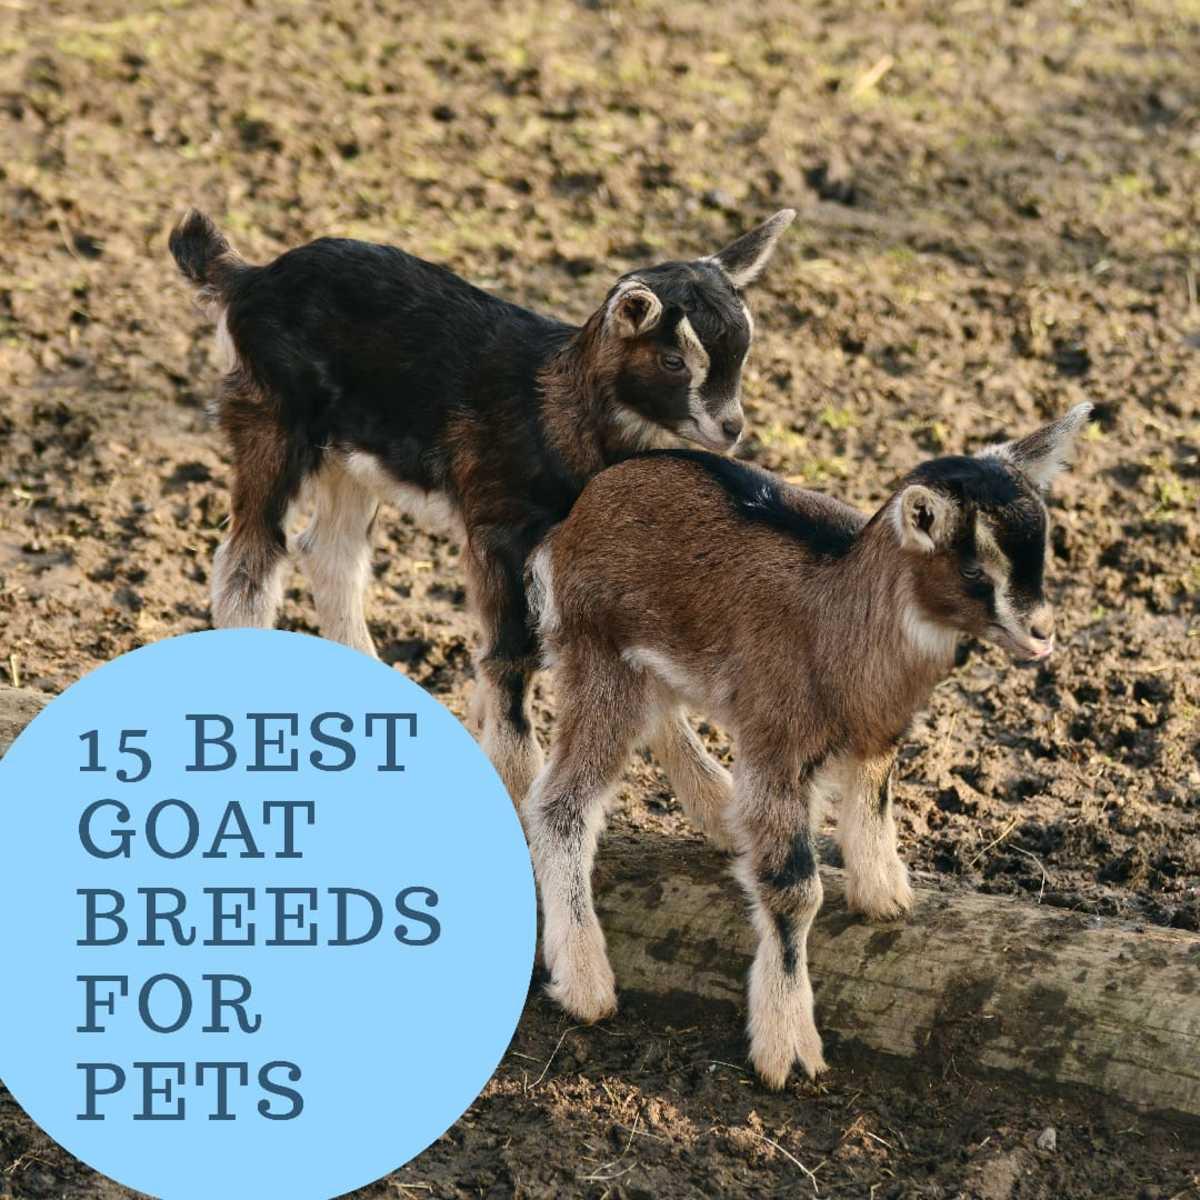 15 Best Goat Breeds for Pets